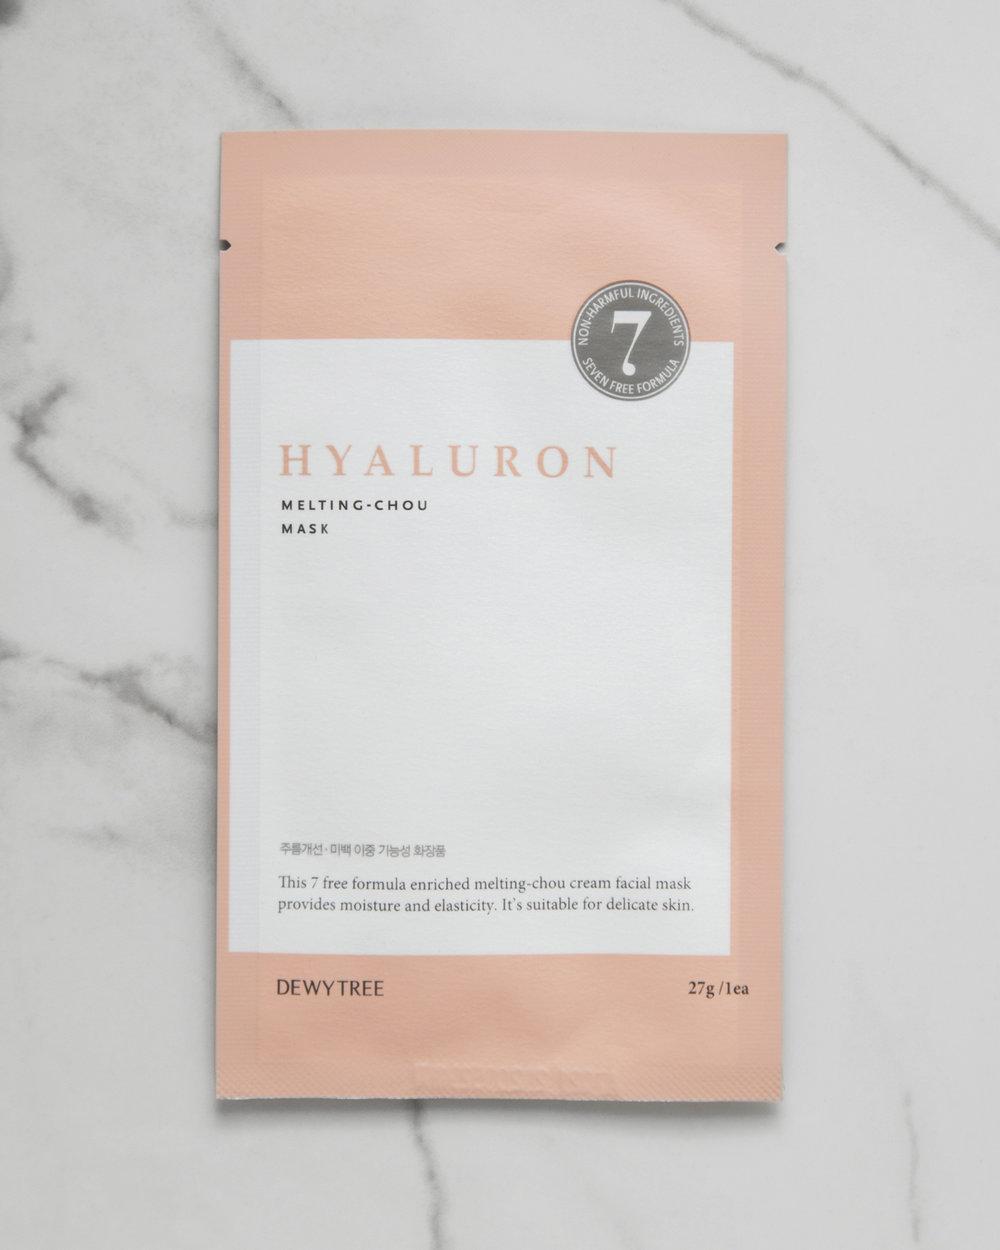 Dewytree Hyaluron Melting-Chou Mask $3.50